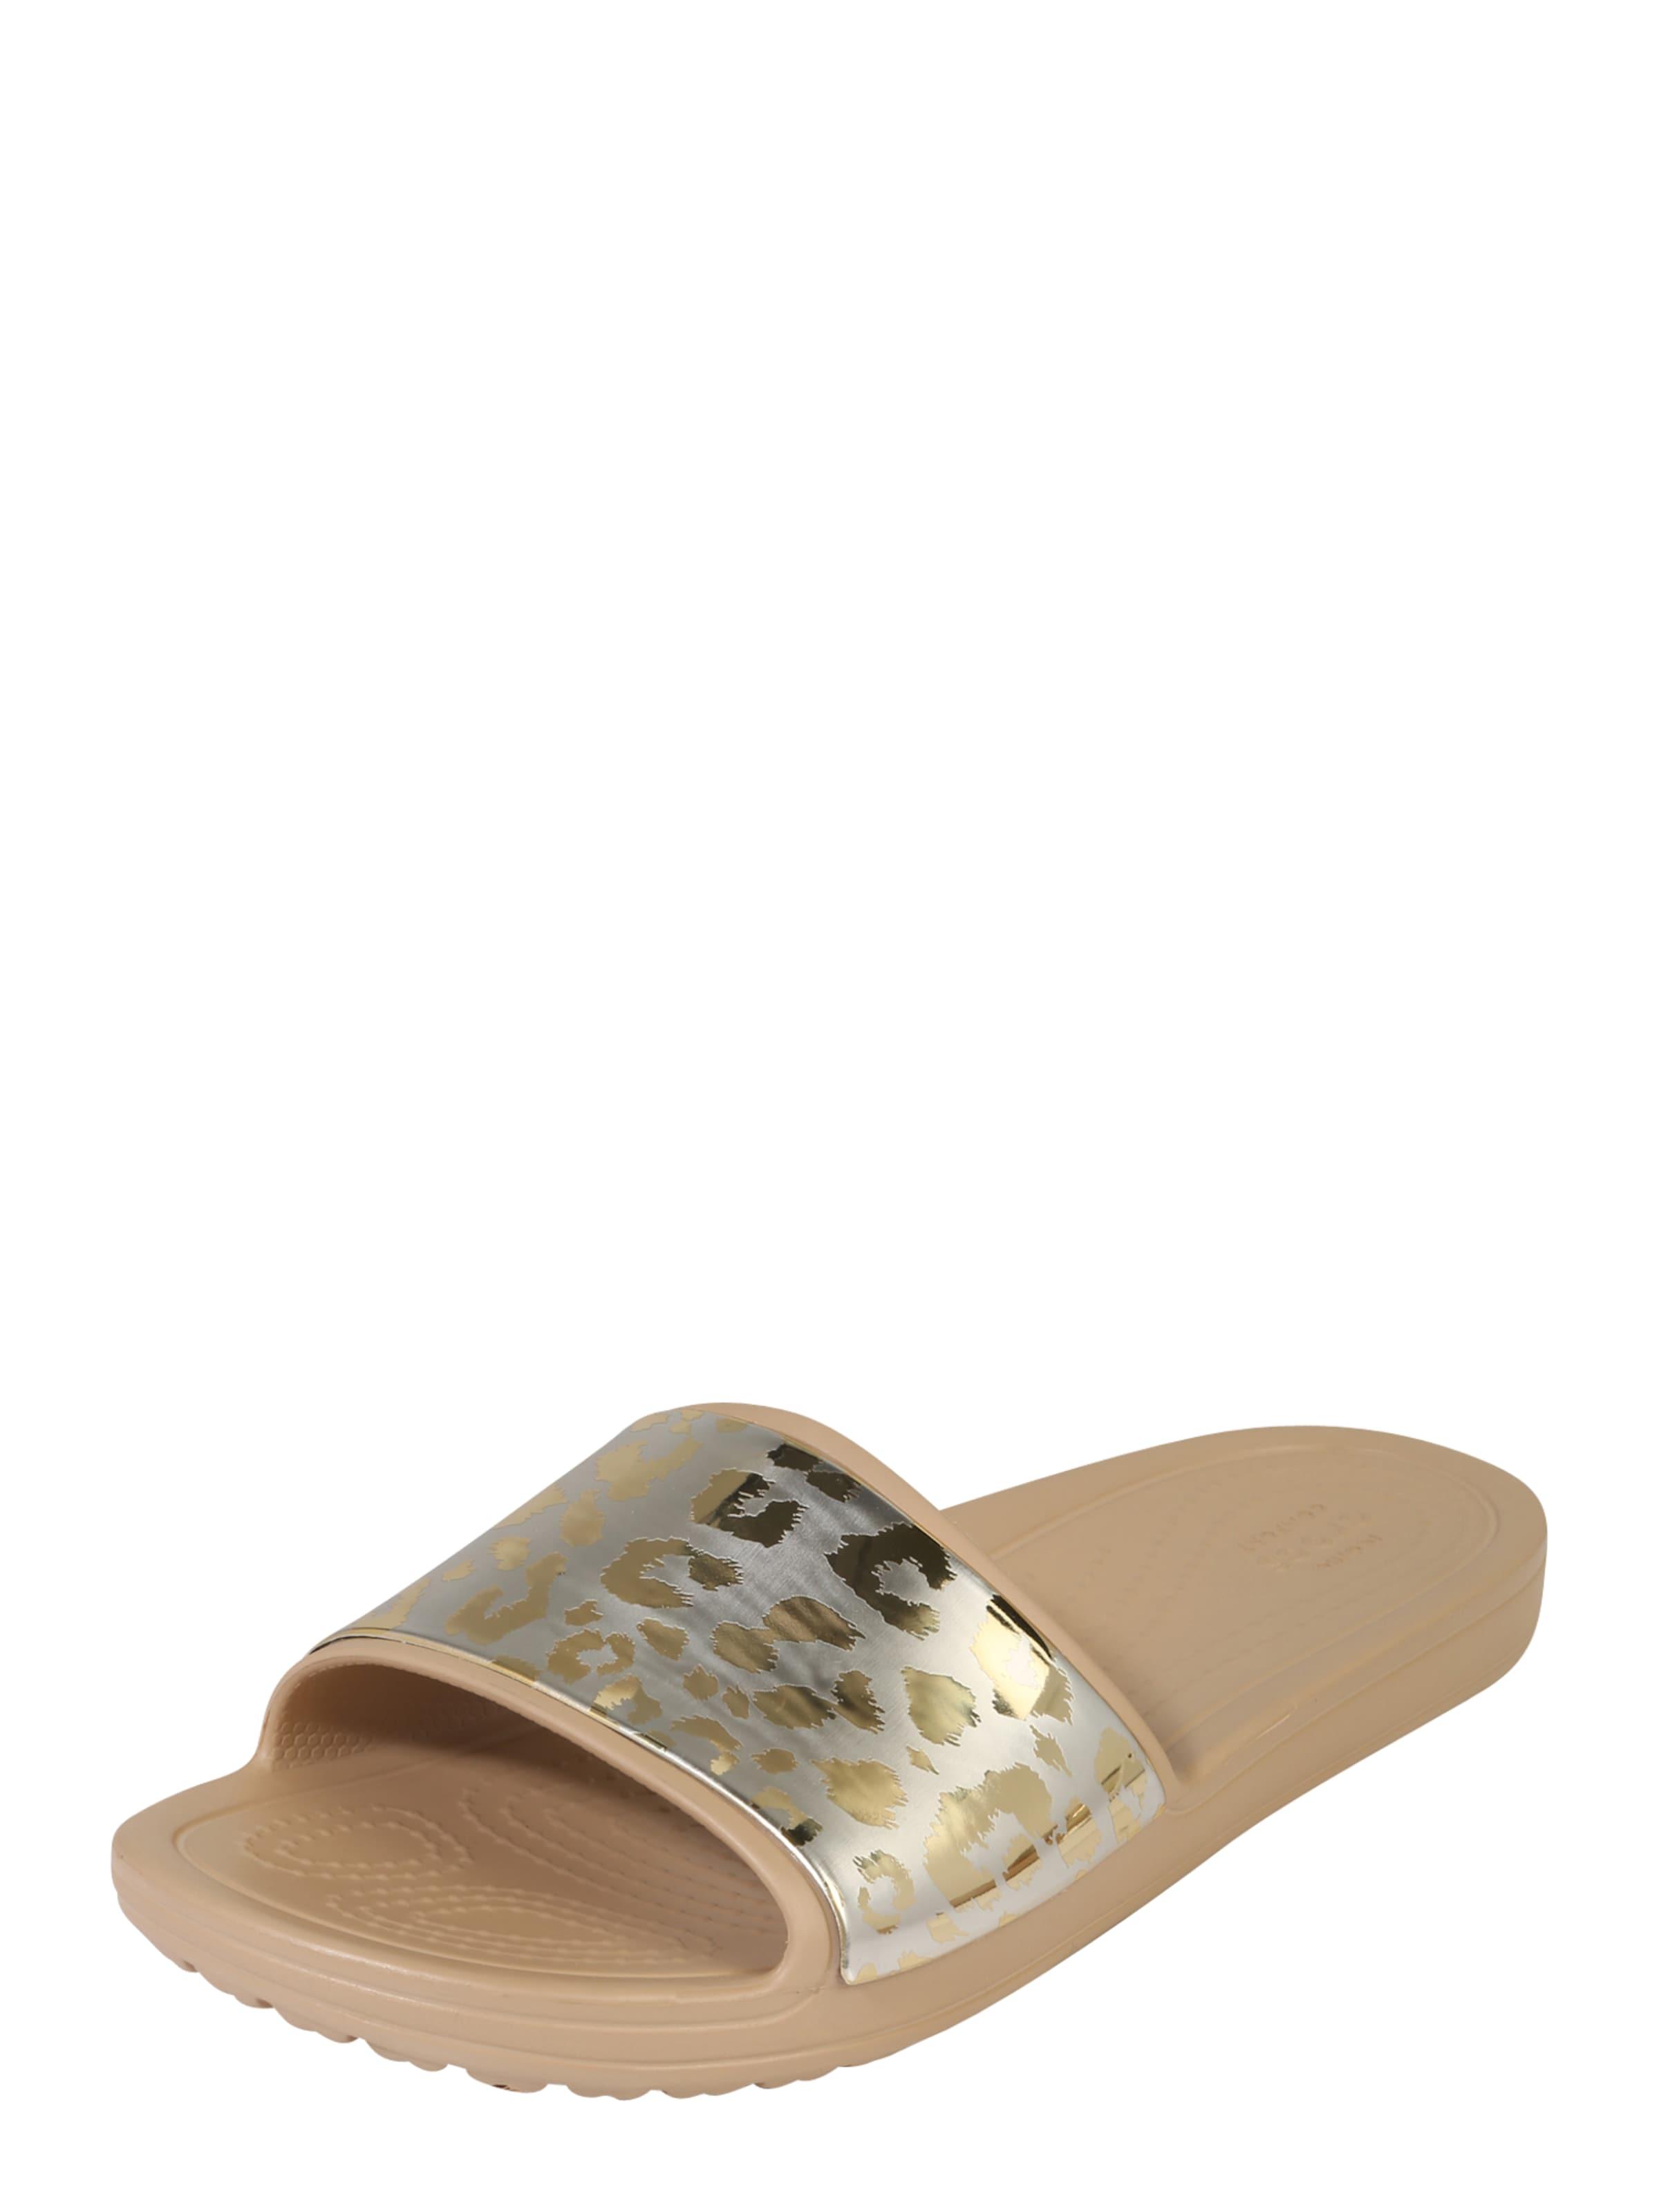 Crocs Pantolette Sloane Verschleißfeste billige Schuhe